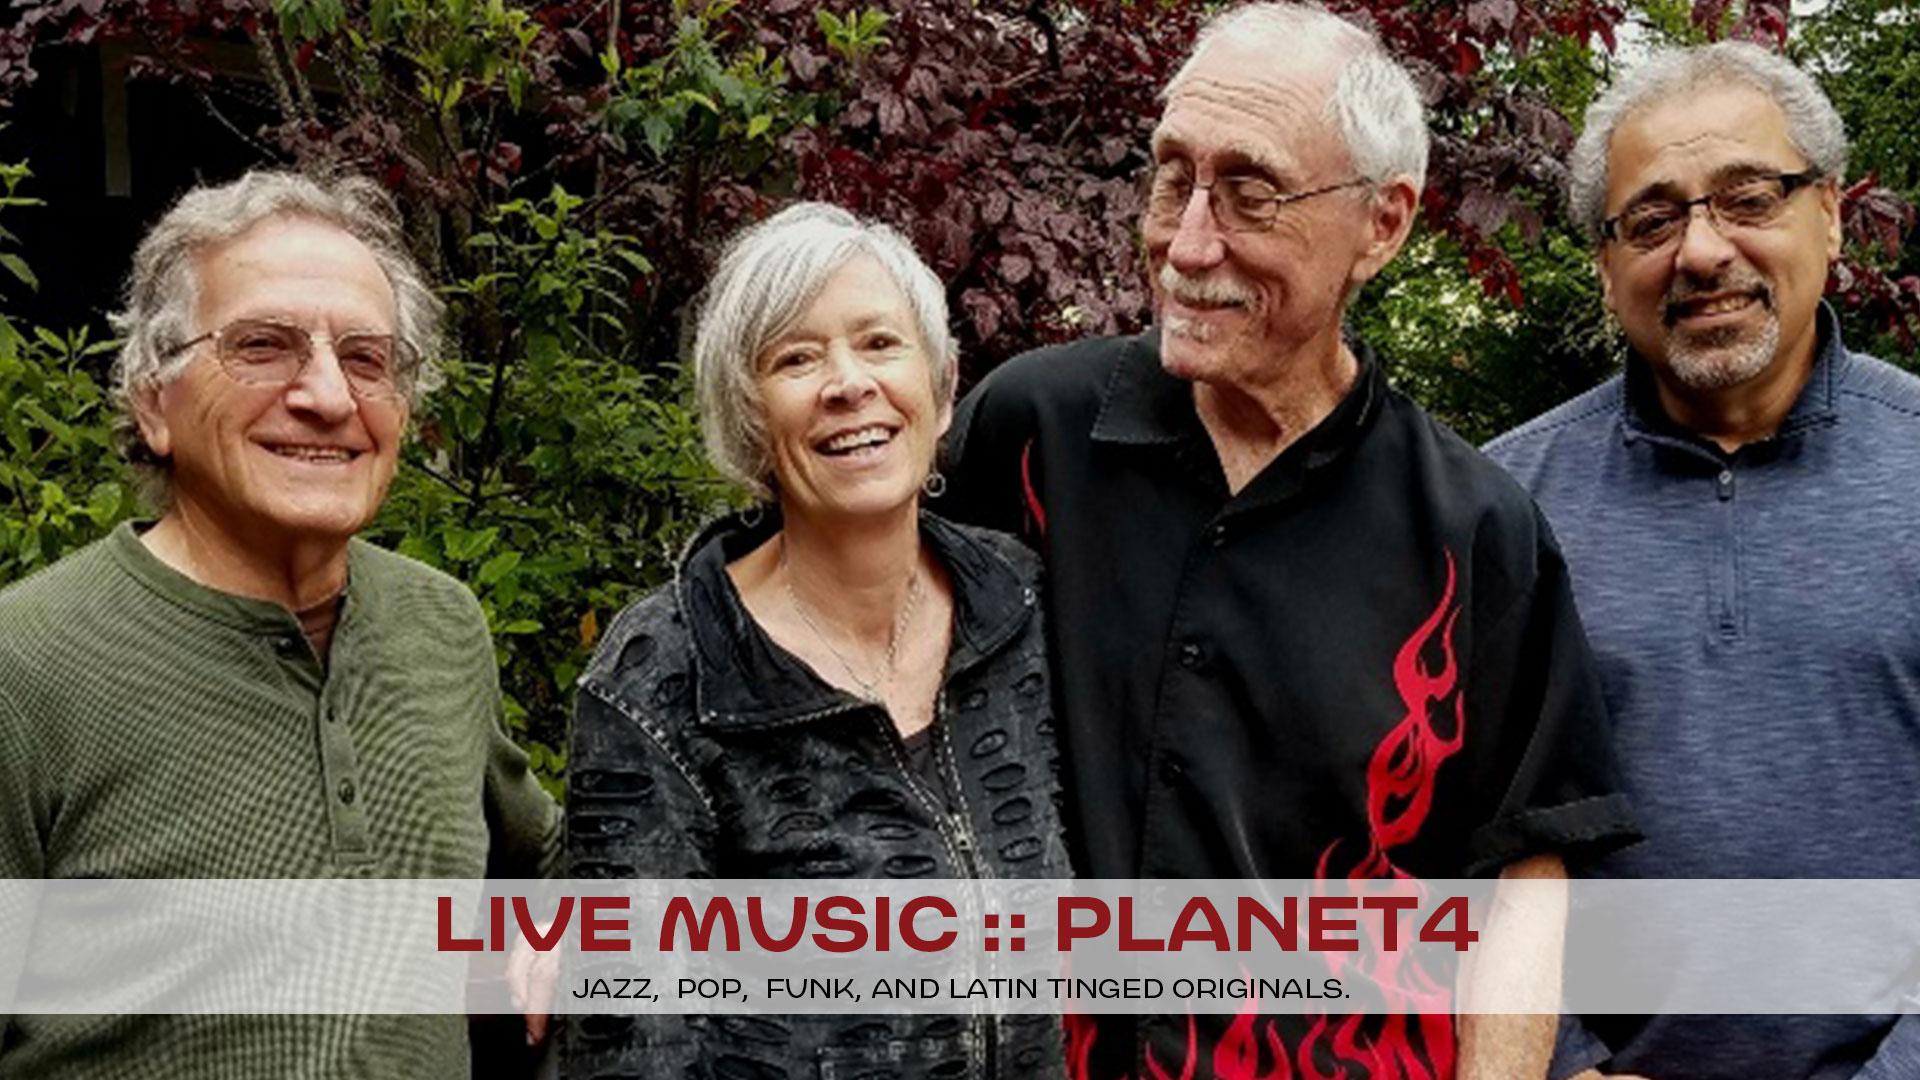 planet-4-2019-7-20